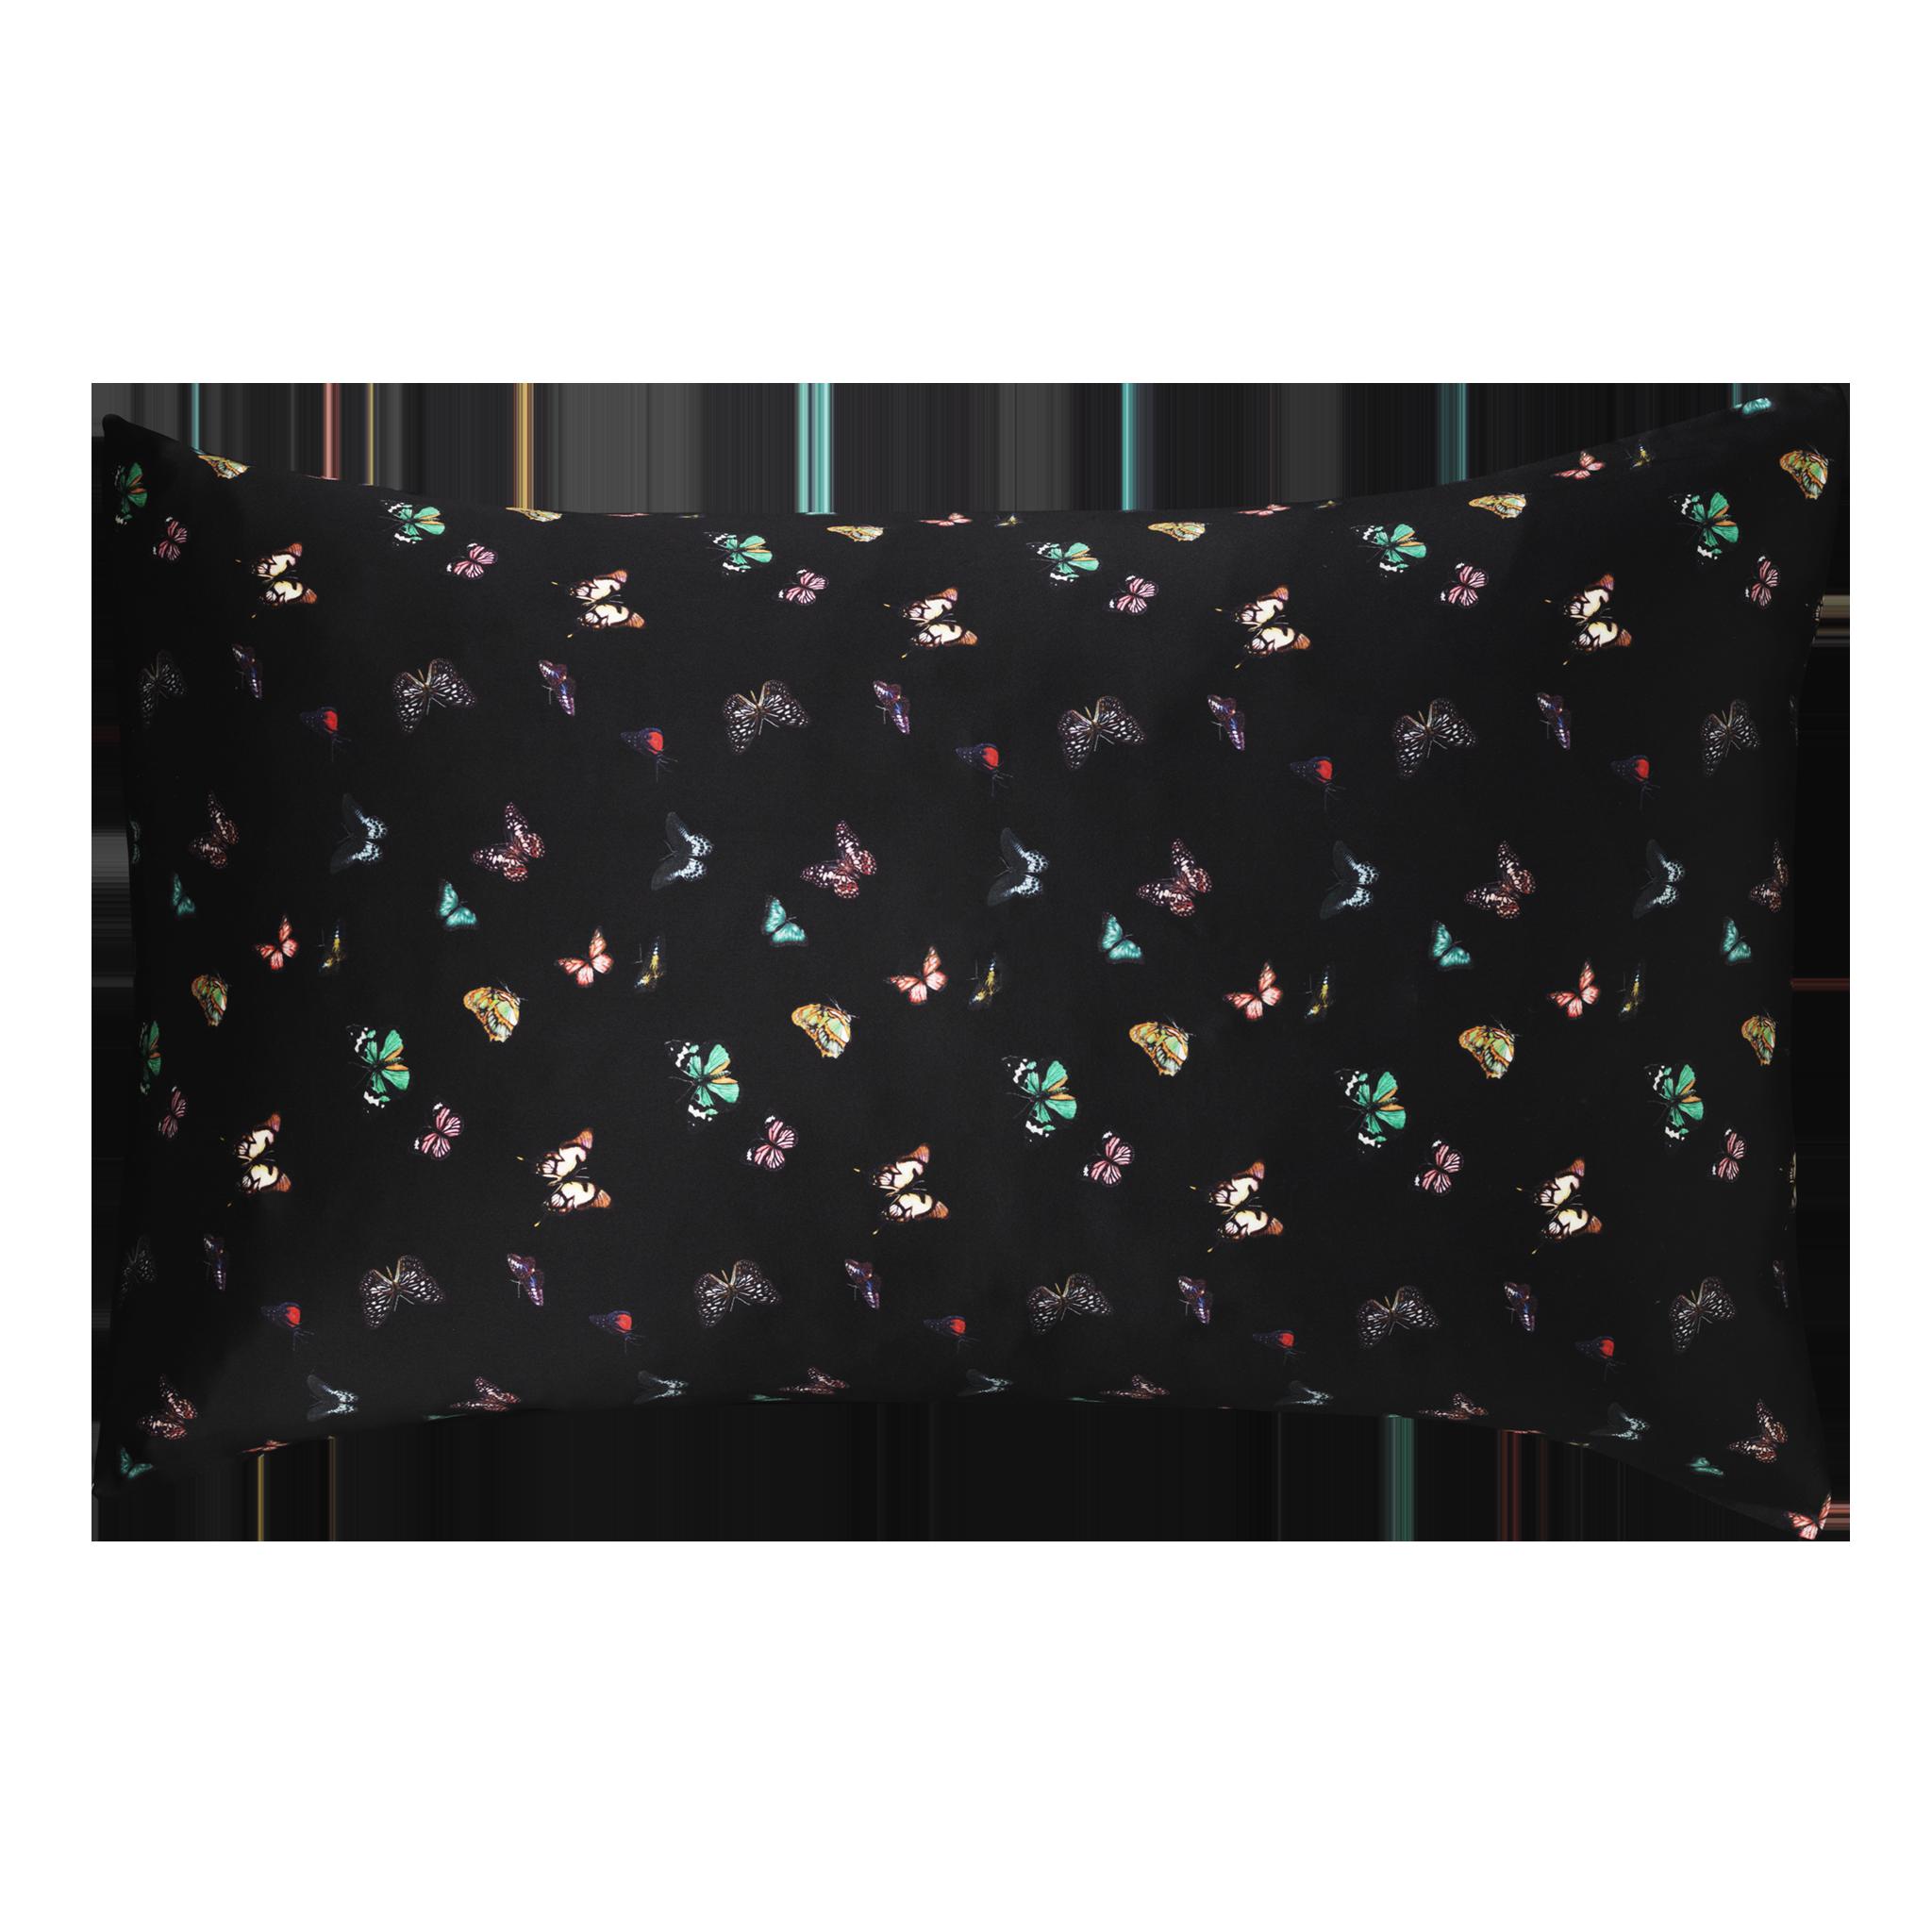 Columba Black | Silk Pillow from The Beauty Sleeper 50 x 75 cm